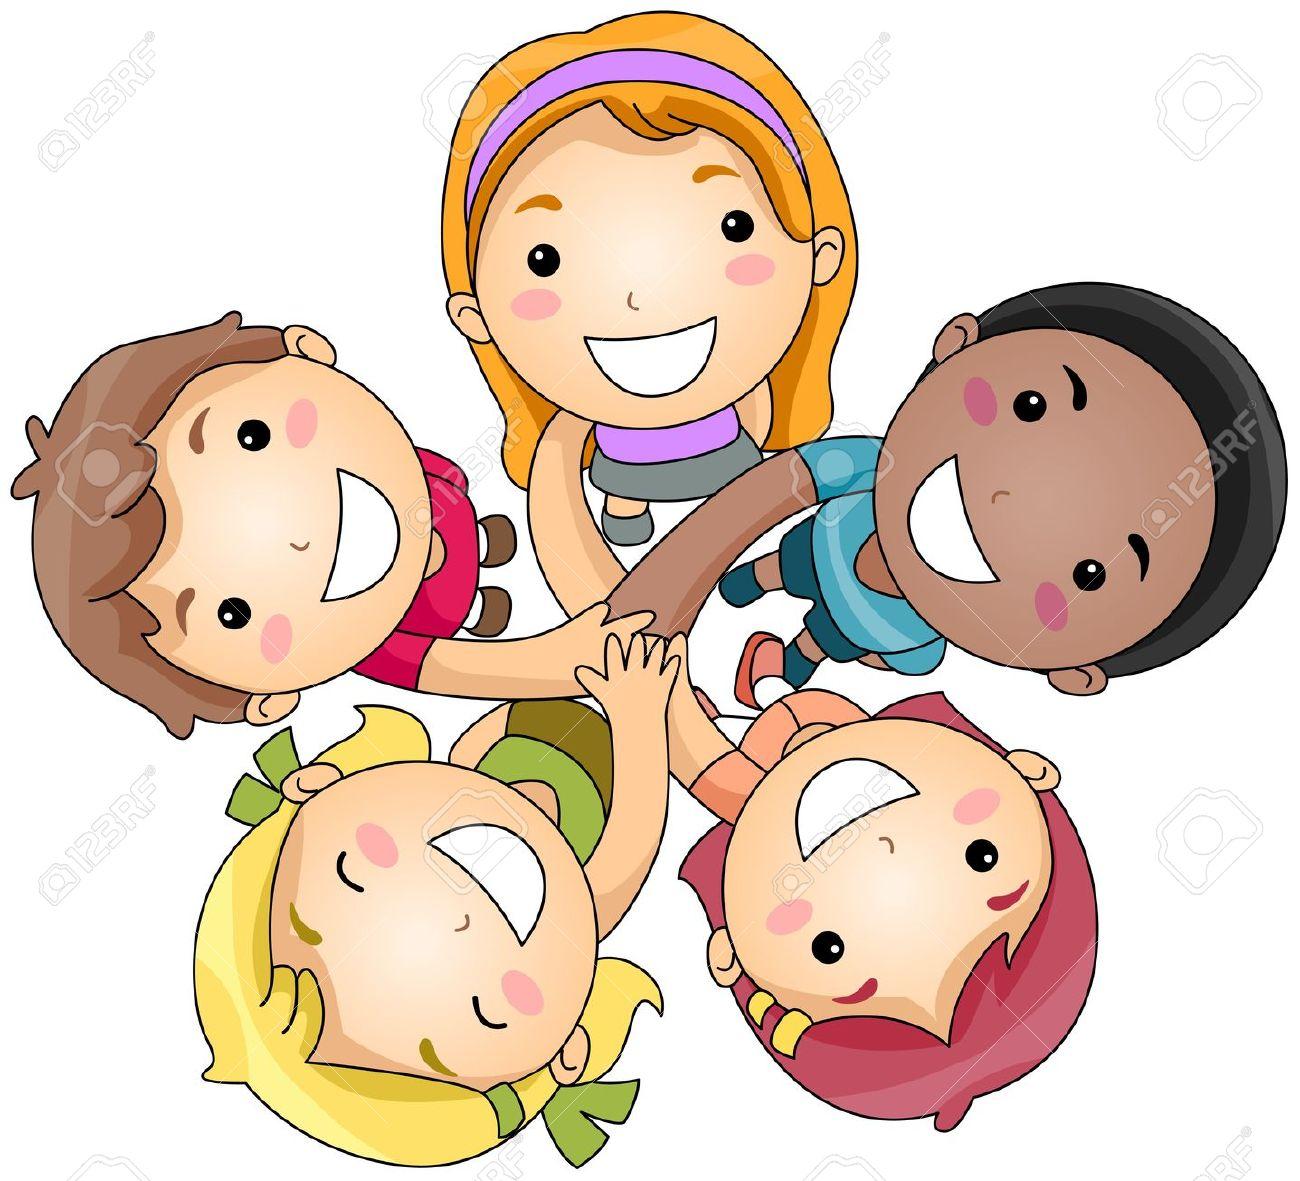 Caring clipart child care. Unity illustration of panda